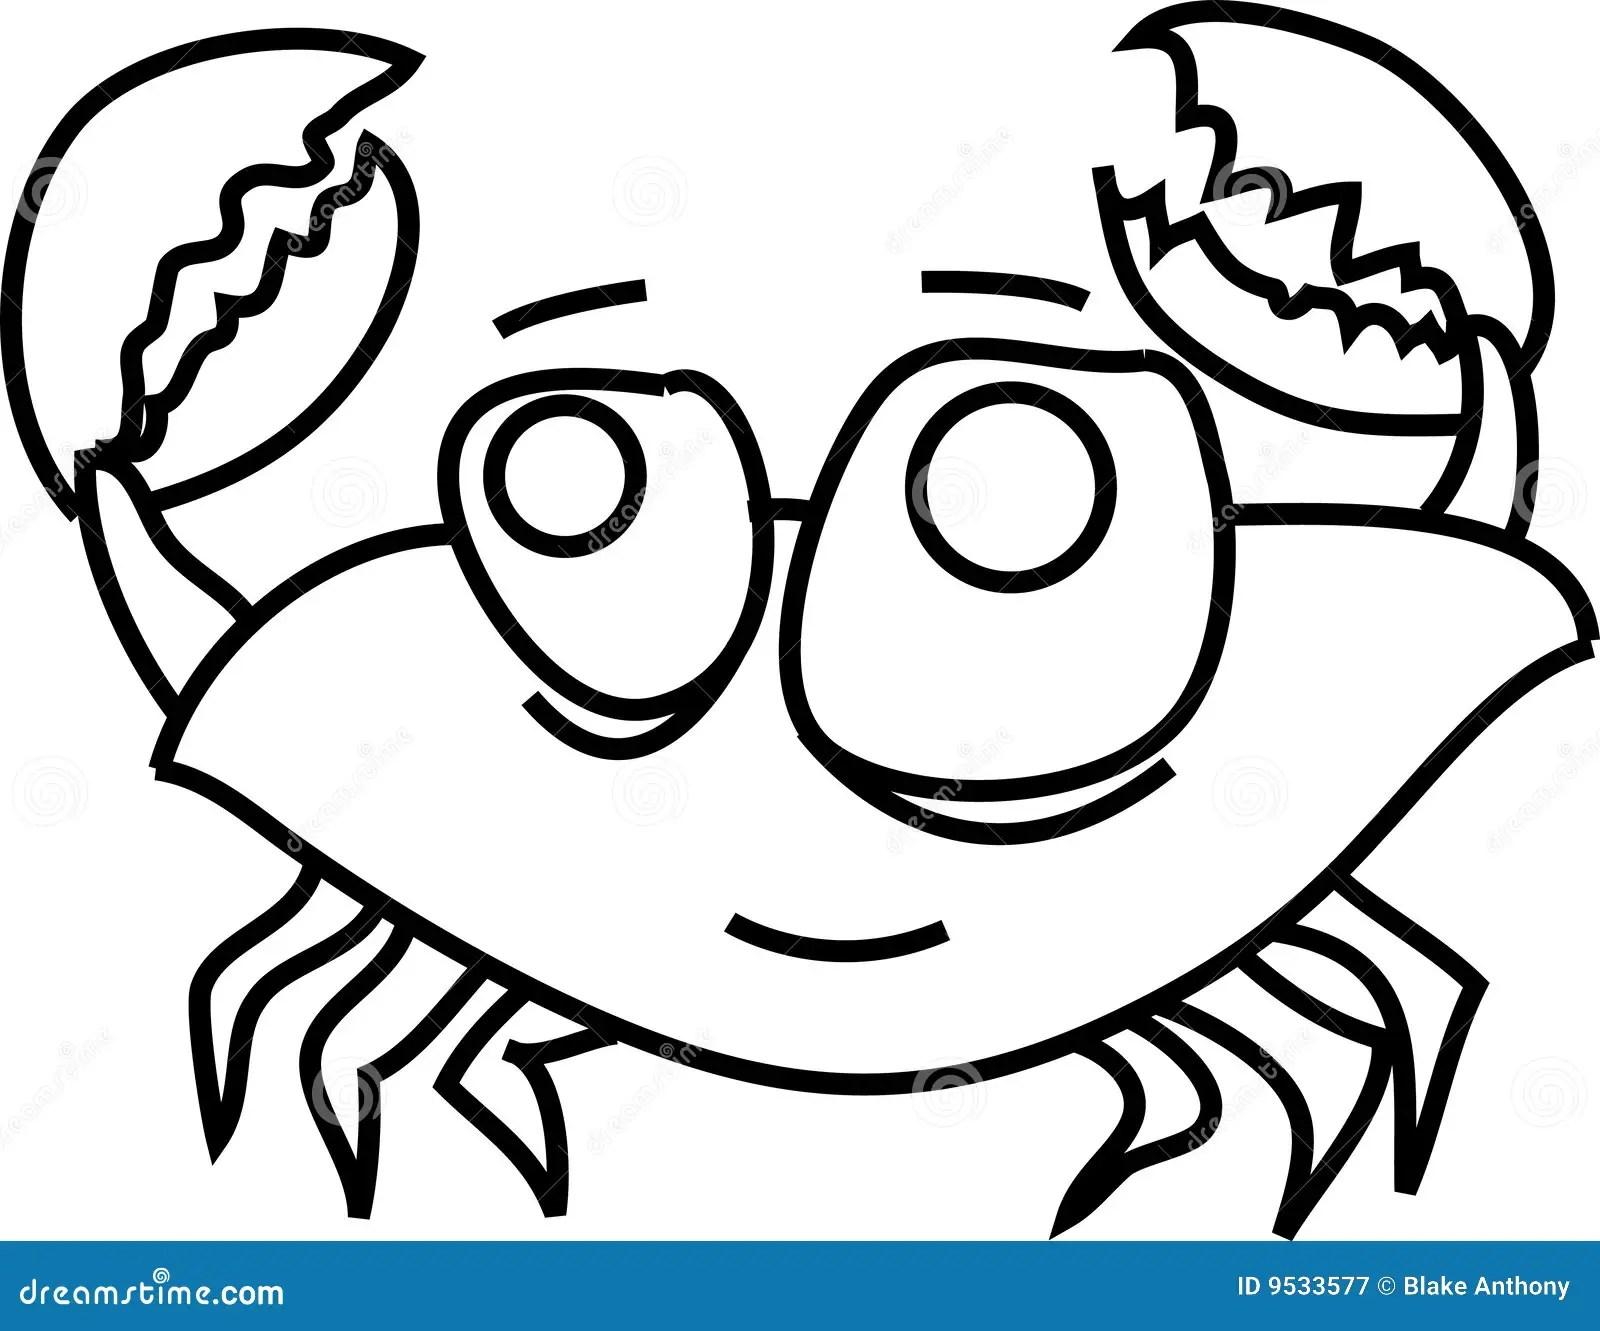 Cartoon funny crab stock vector. Illustration of fish